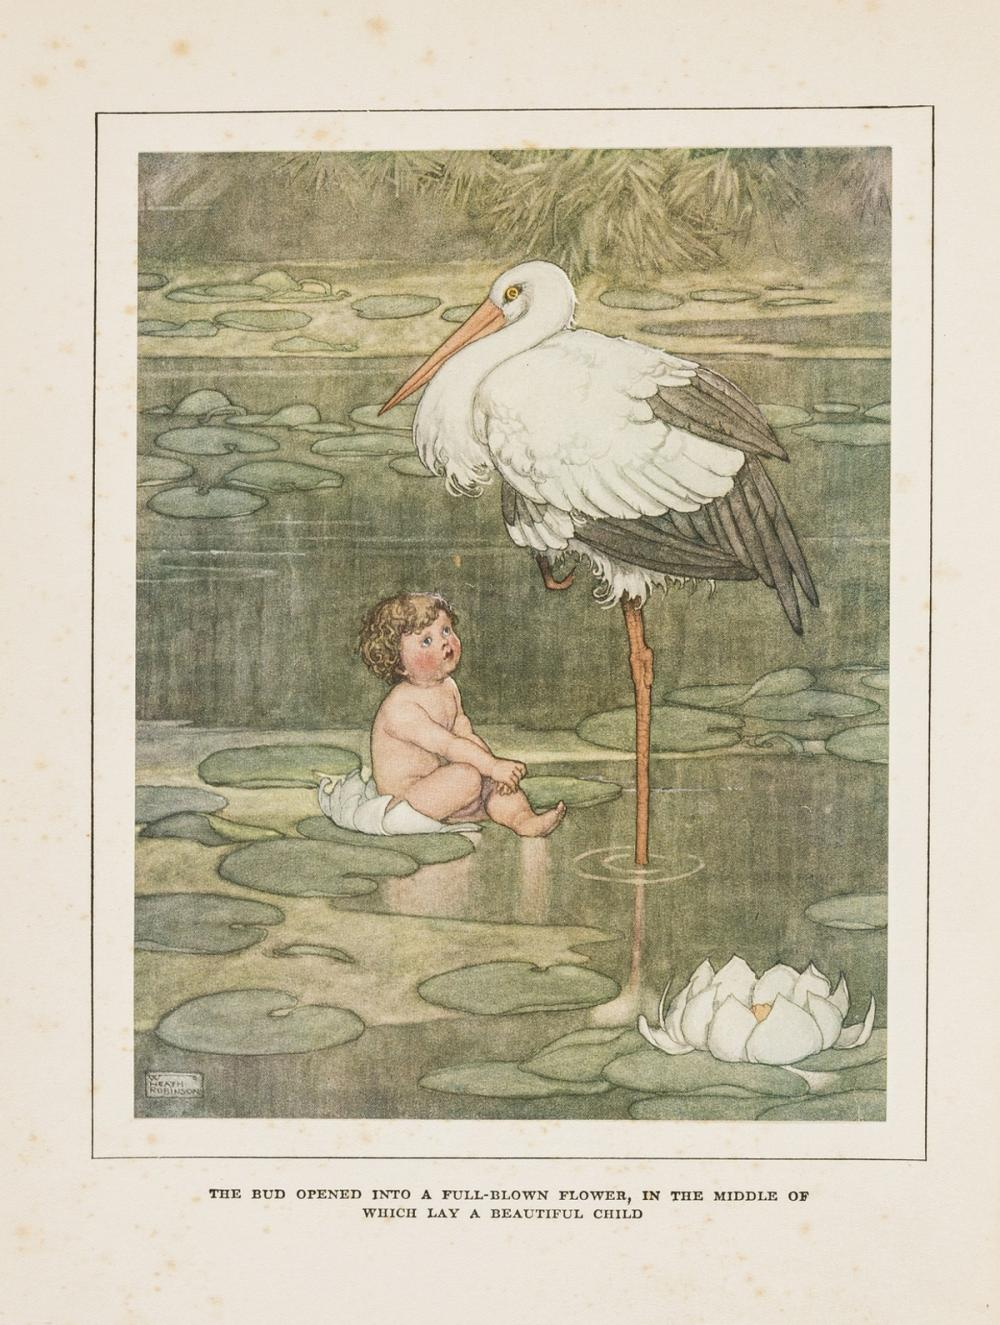 Robinson (W.Heath).- Andersen (Hans Christian) Fairy Tales, 16 colour plates by W.Heath Robinson, Boots the Chemists, 1927 & others (4)